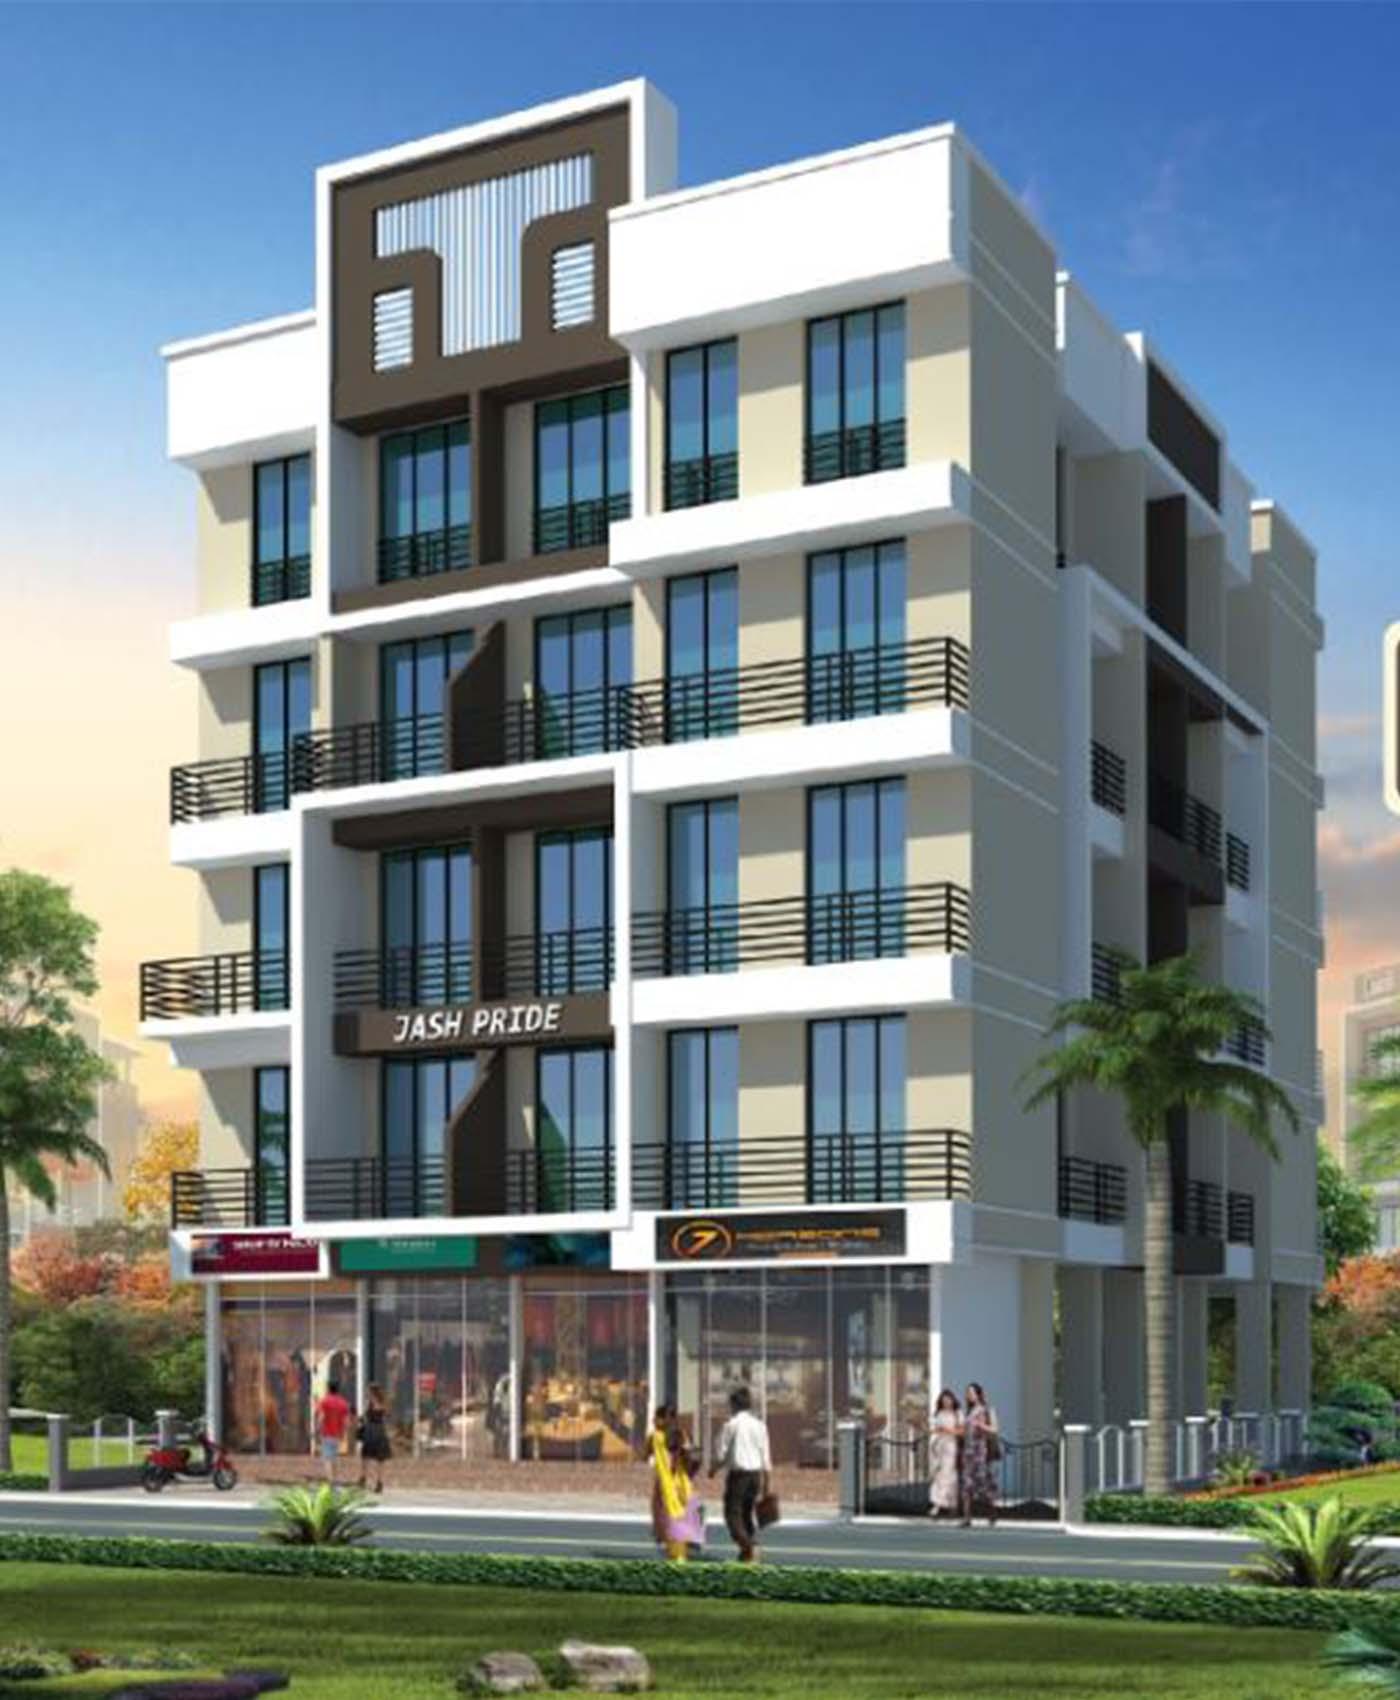 Copper Terrace Apartments: Affordable Flats With Terrace In Panvel, Navi Mumbai